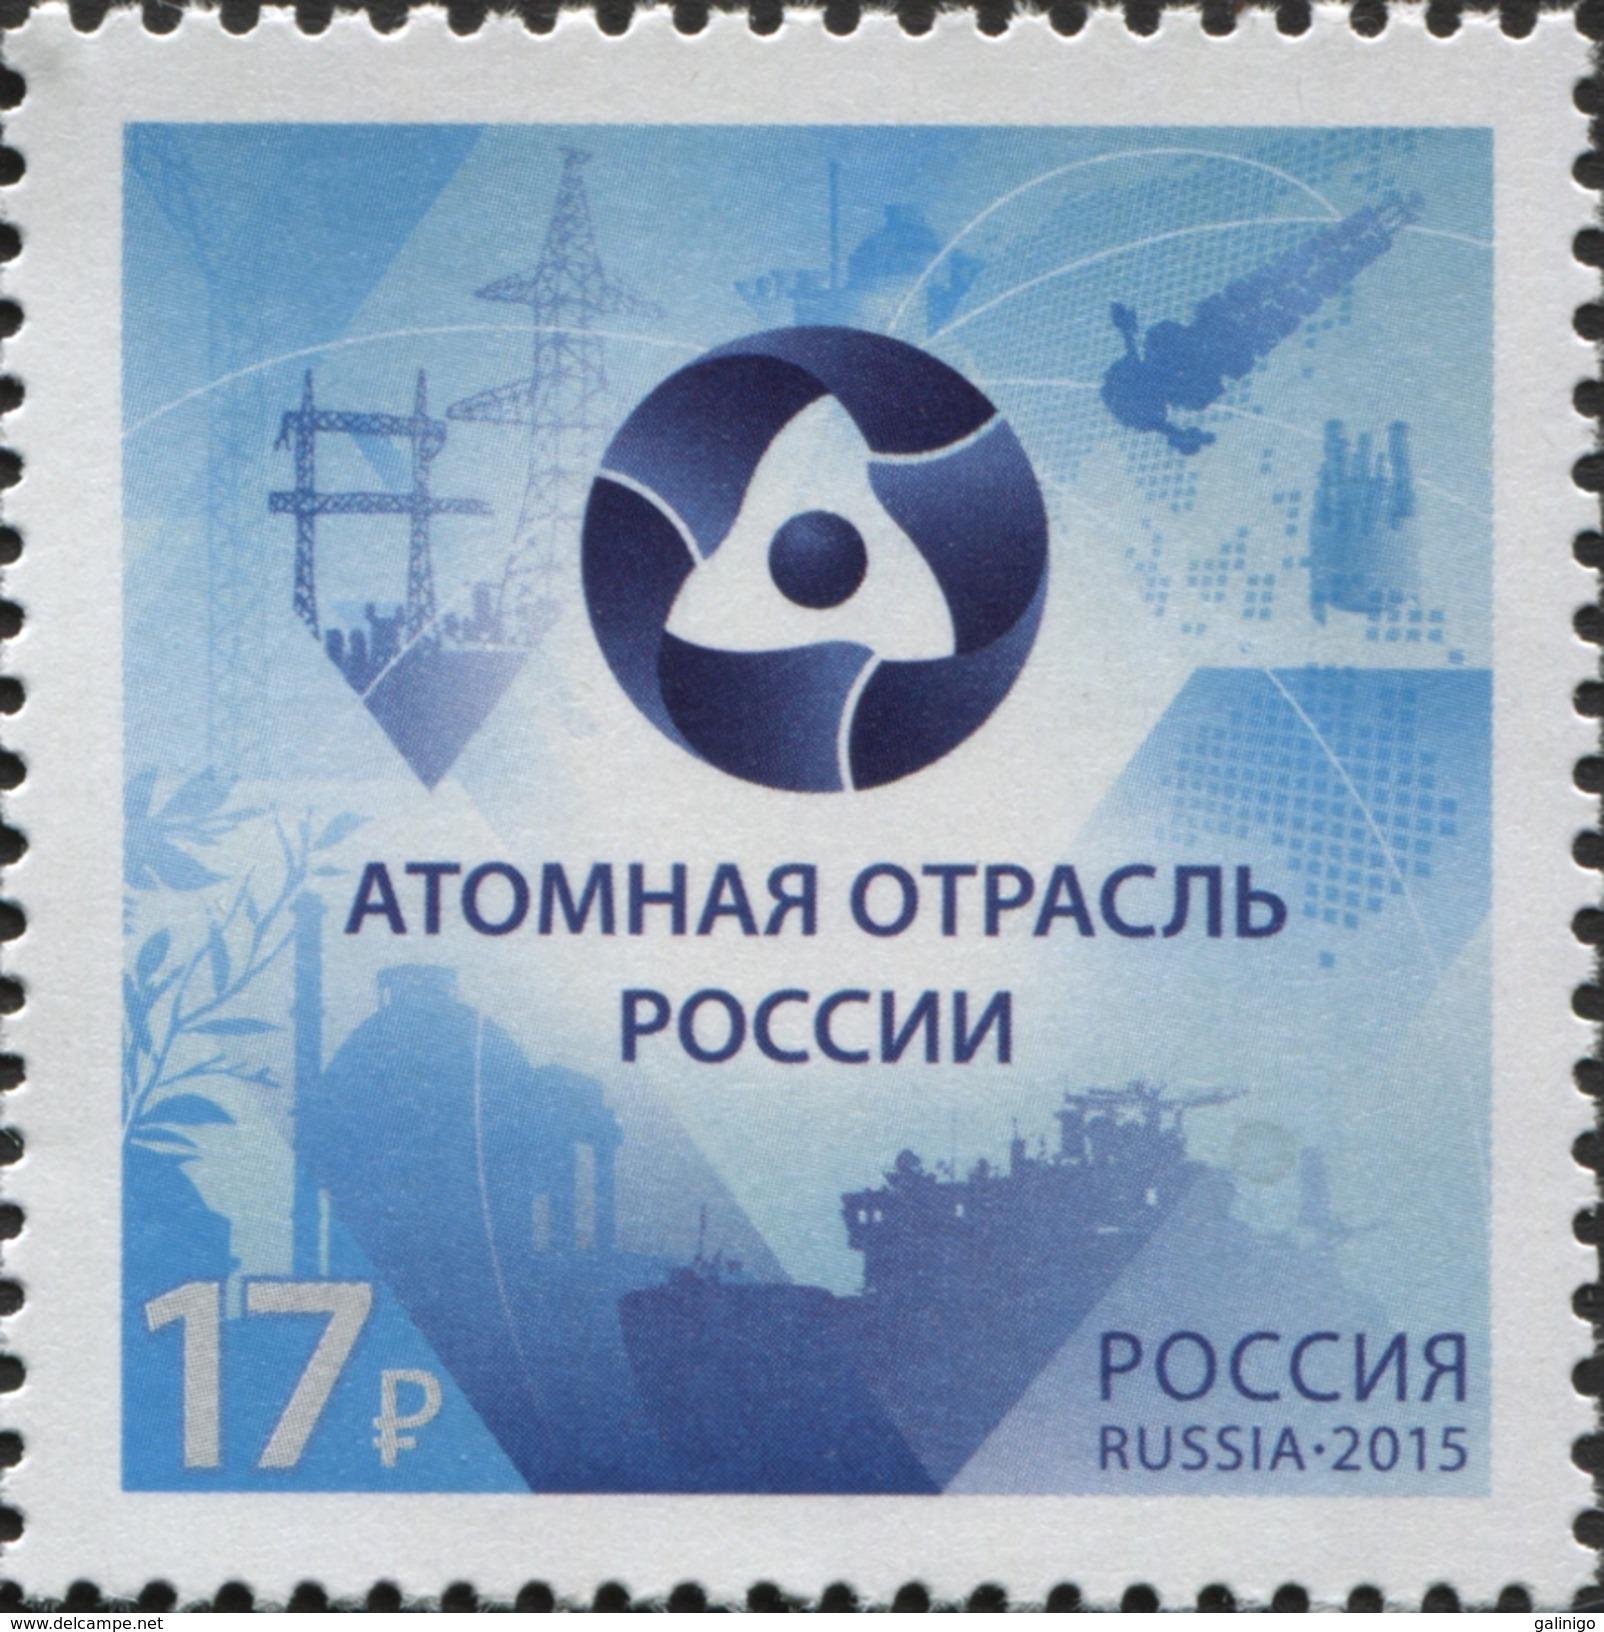 2015 1v Russia Russland Russie Rusia Russian Nuclear Industry-Energies-Atom-icebreaker  Mi 2223 MNH ** - Navi Polari E Rompighiaccio